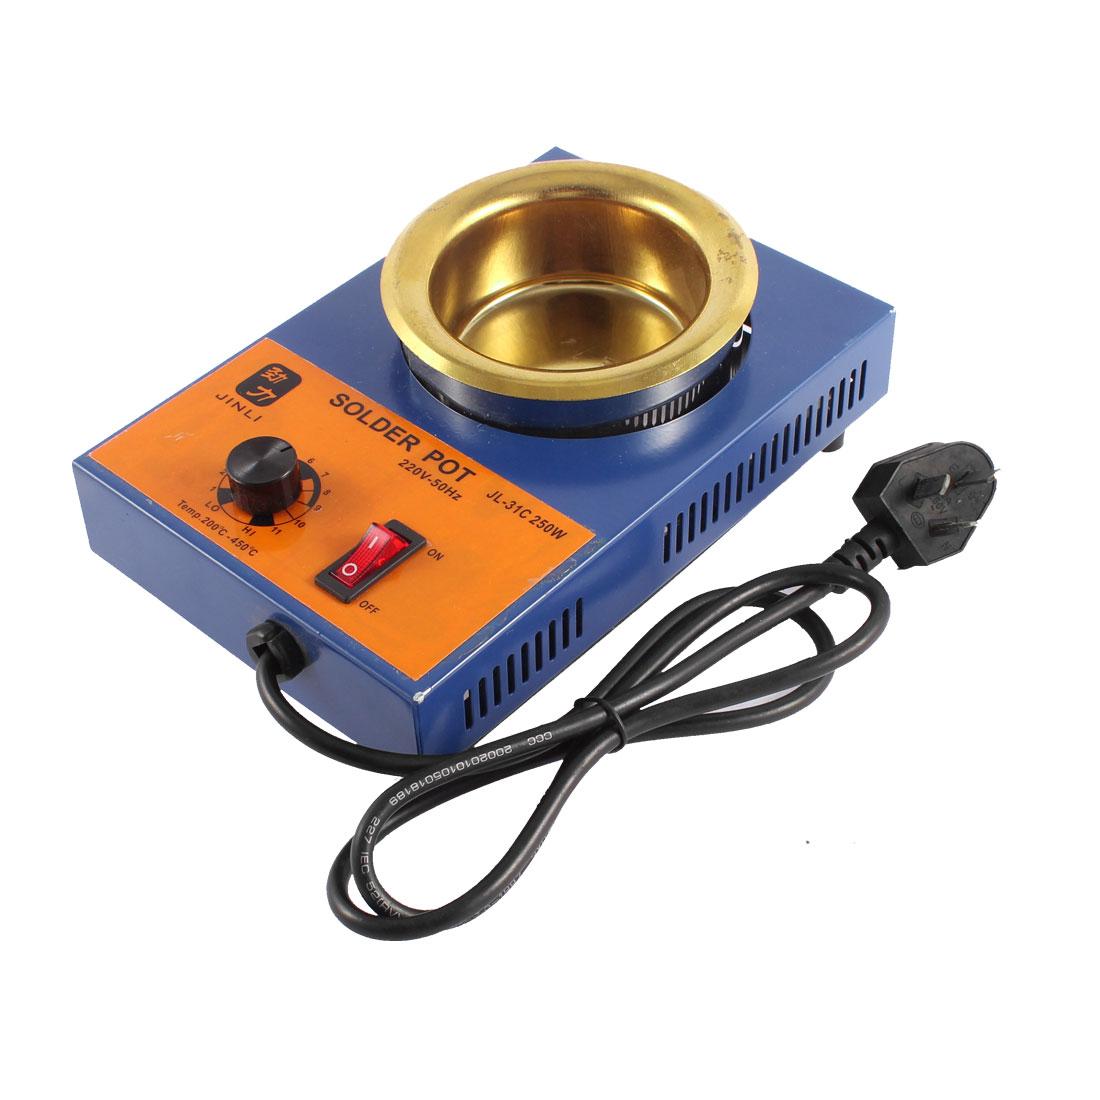 AU Plug AC 220V 250W Adjustable Temperature 80mm Dia Solder Pot Soldering Desoldering Bath w 600g Capacity